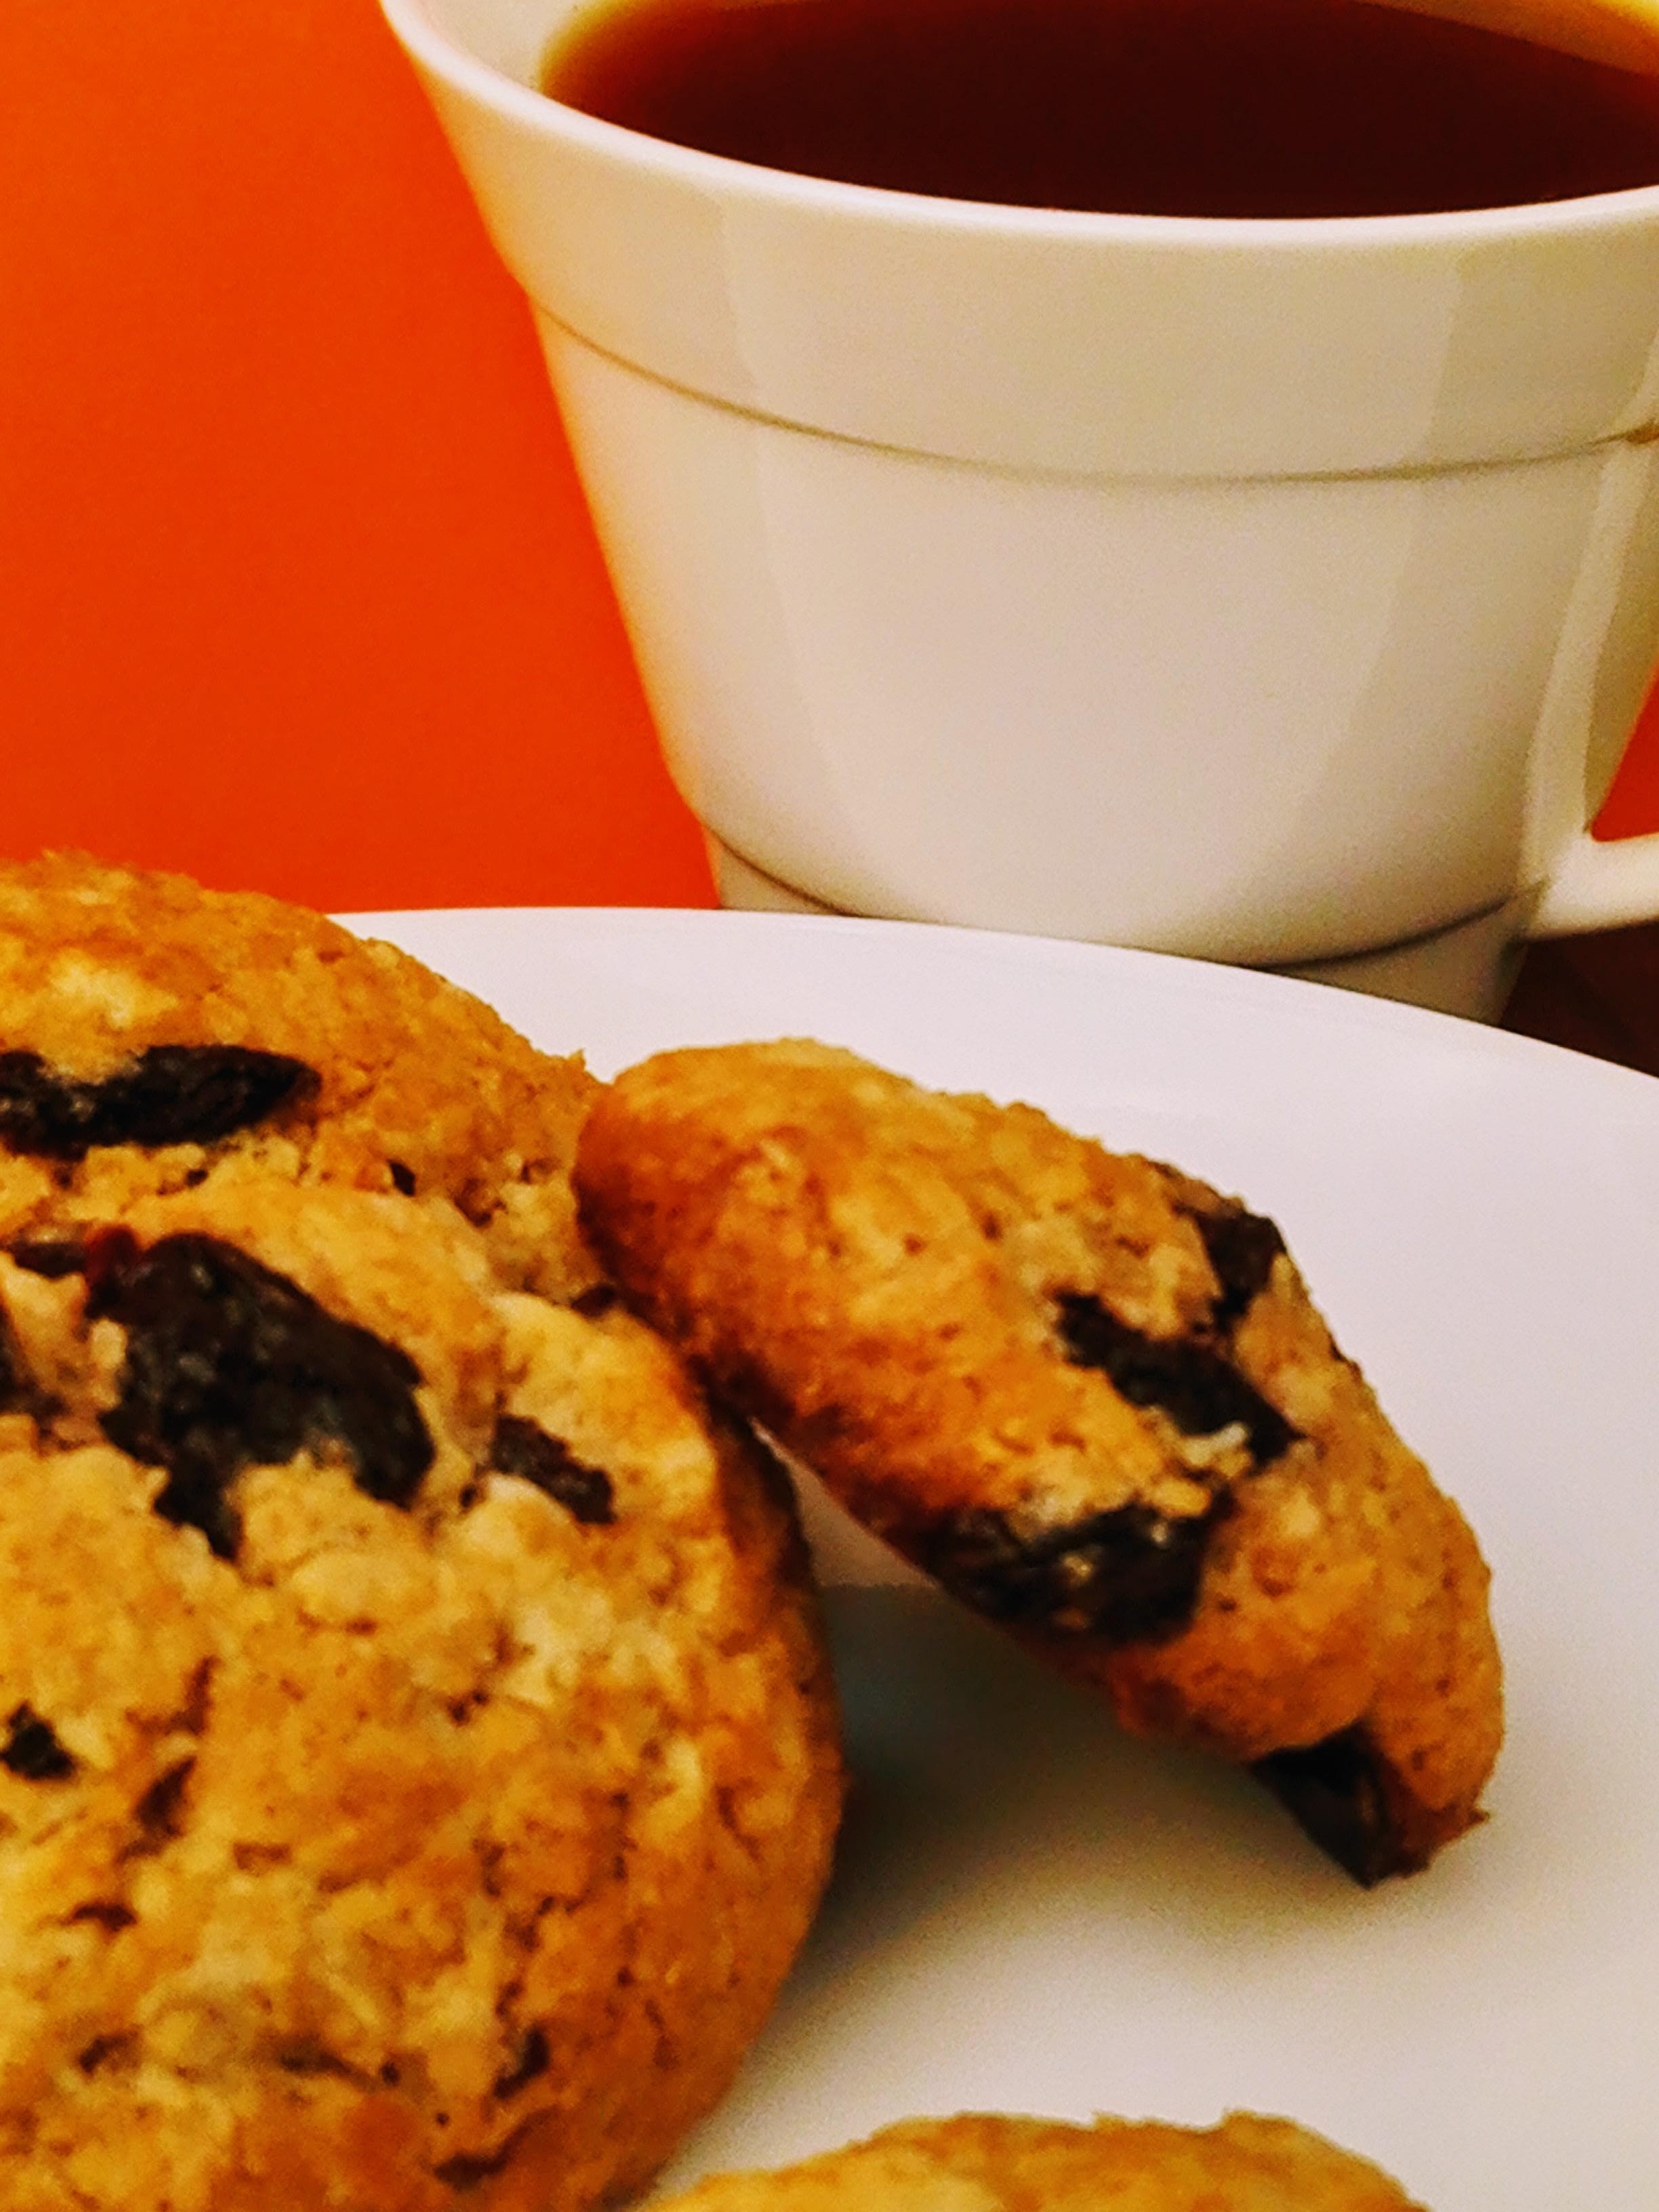 Coconut Cookies With Sour Cherries